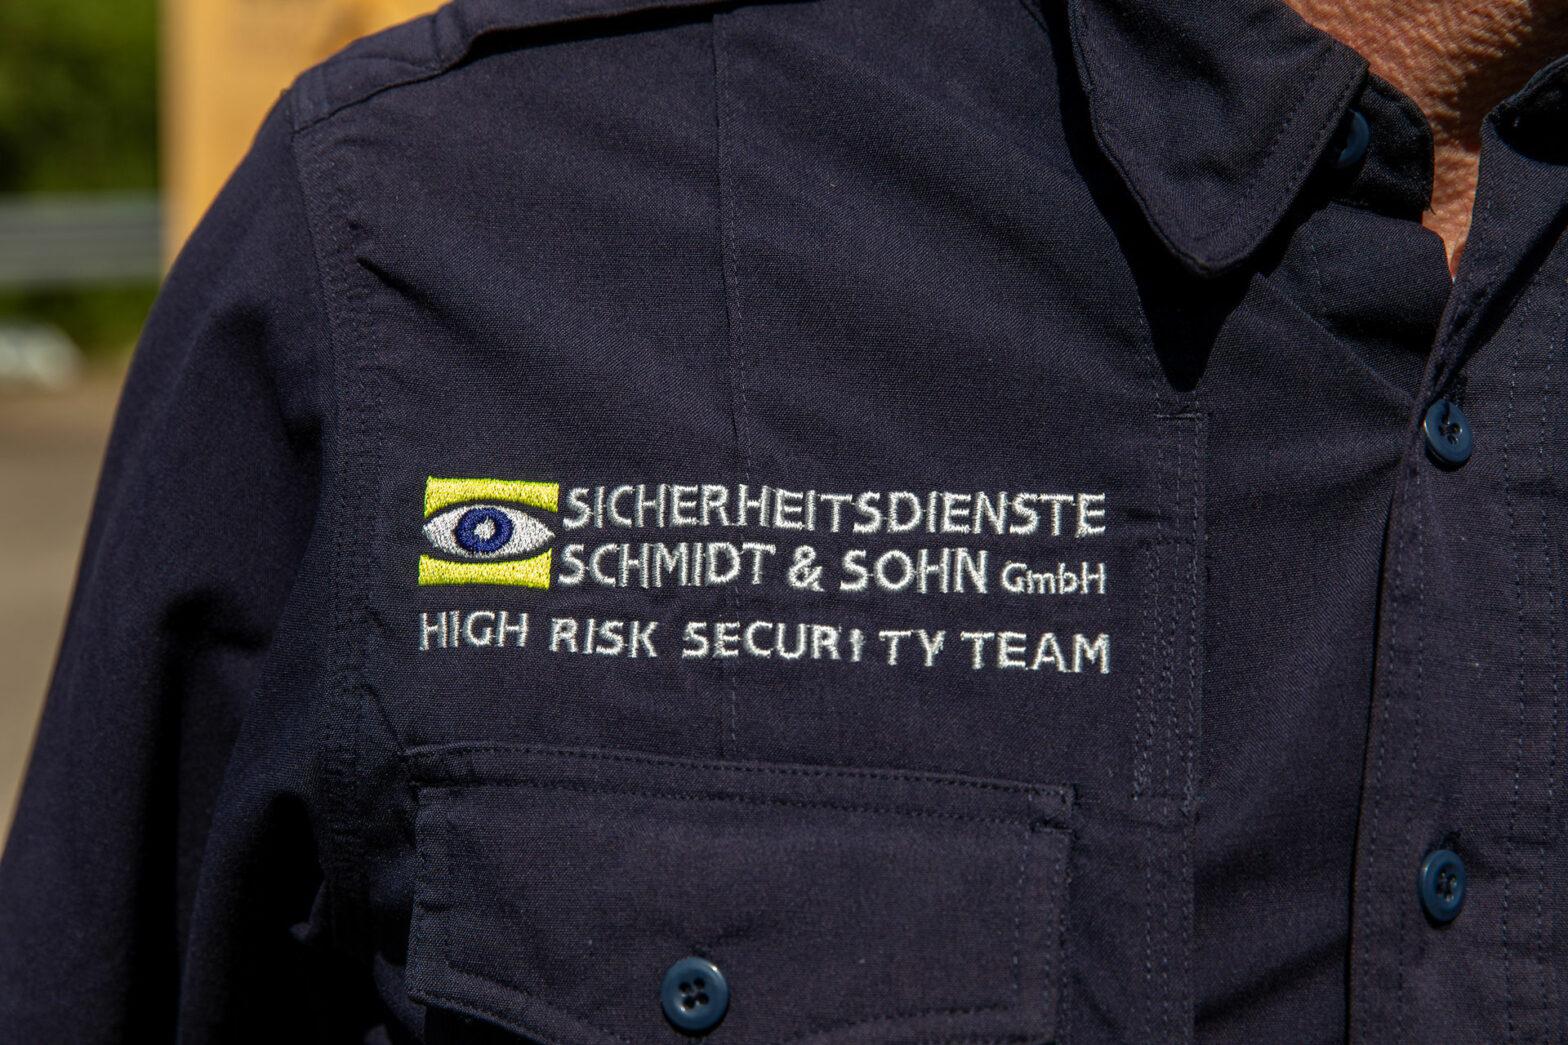 High Risk Security Team